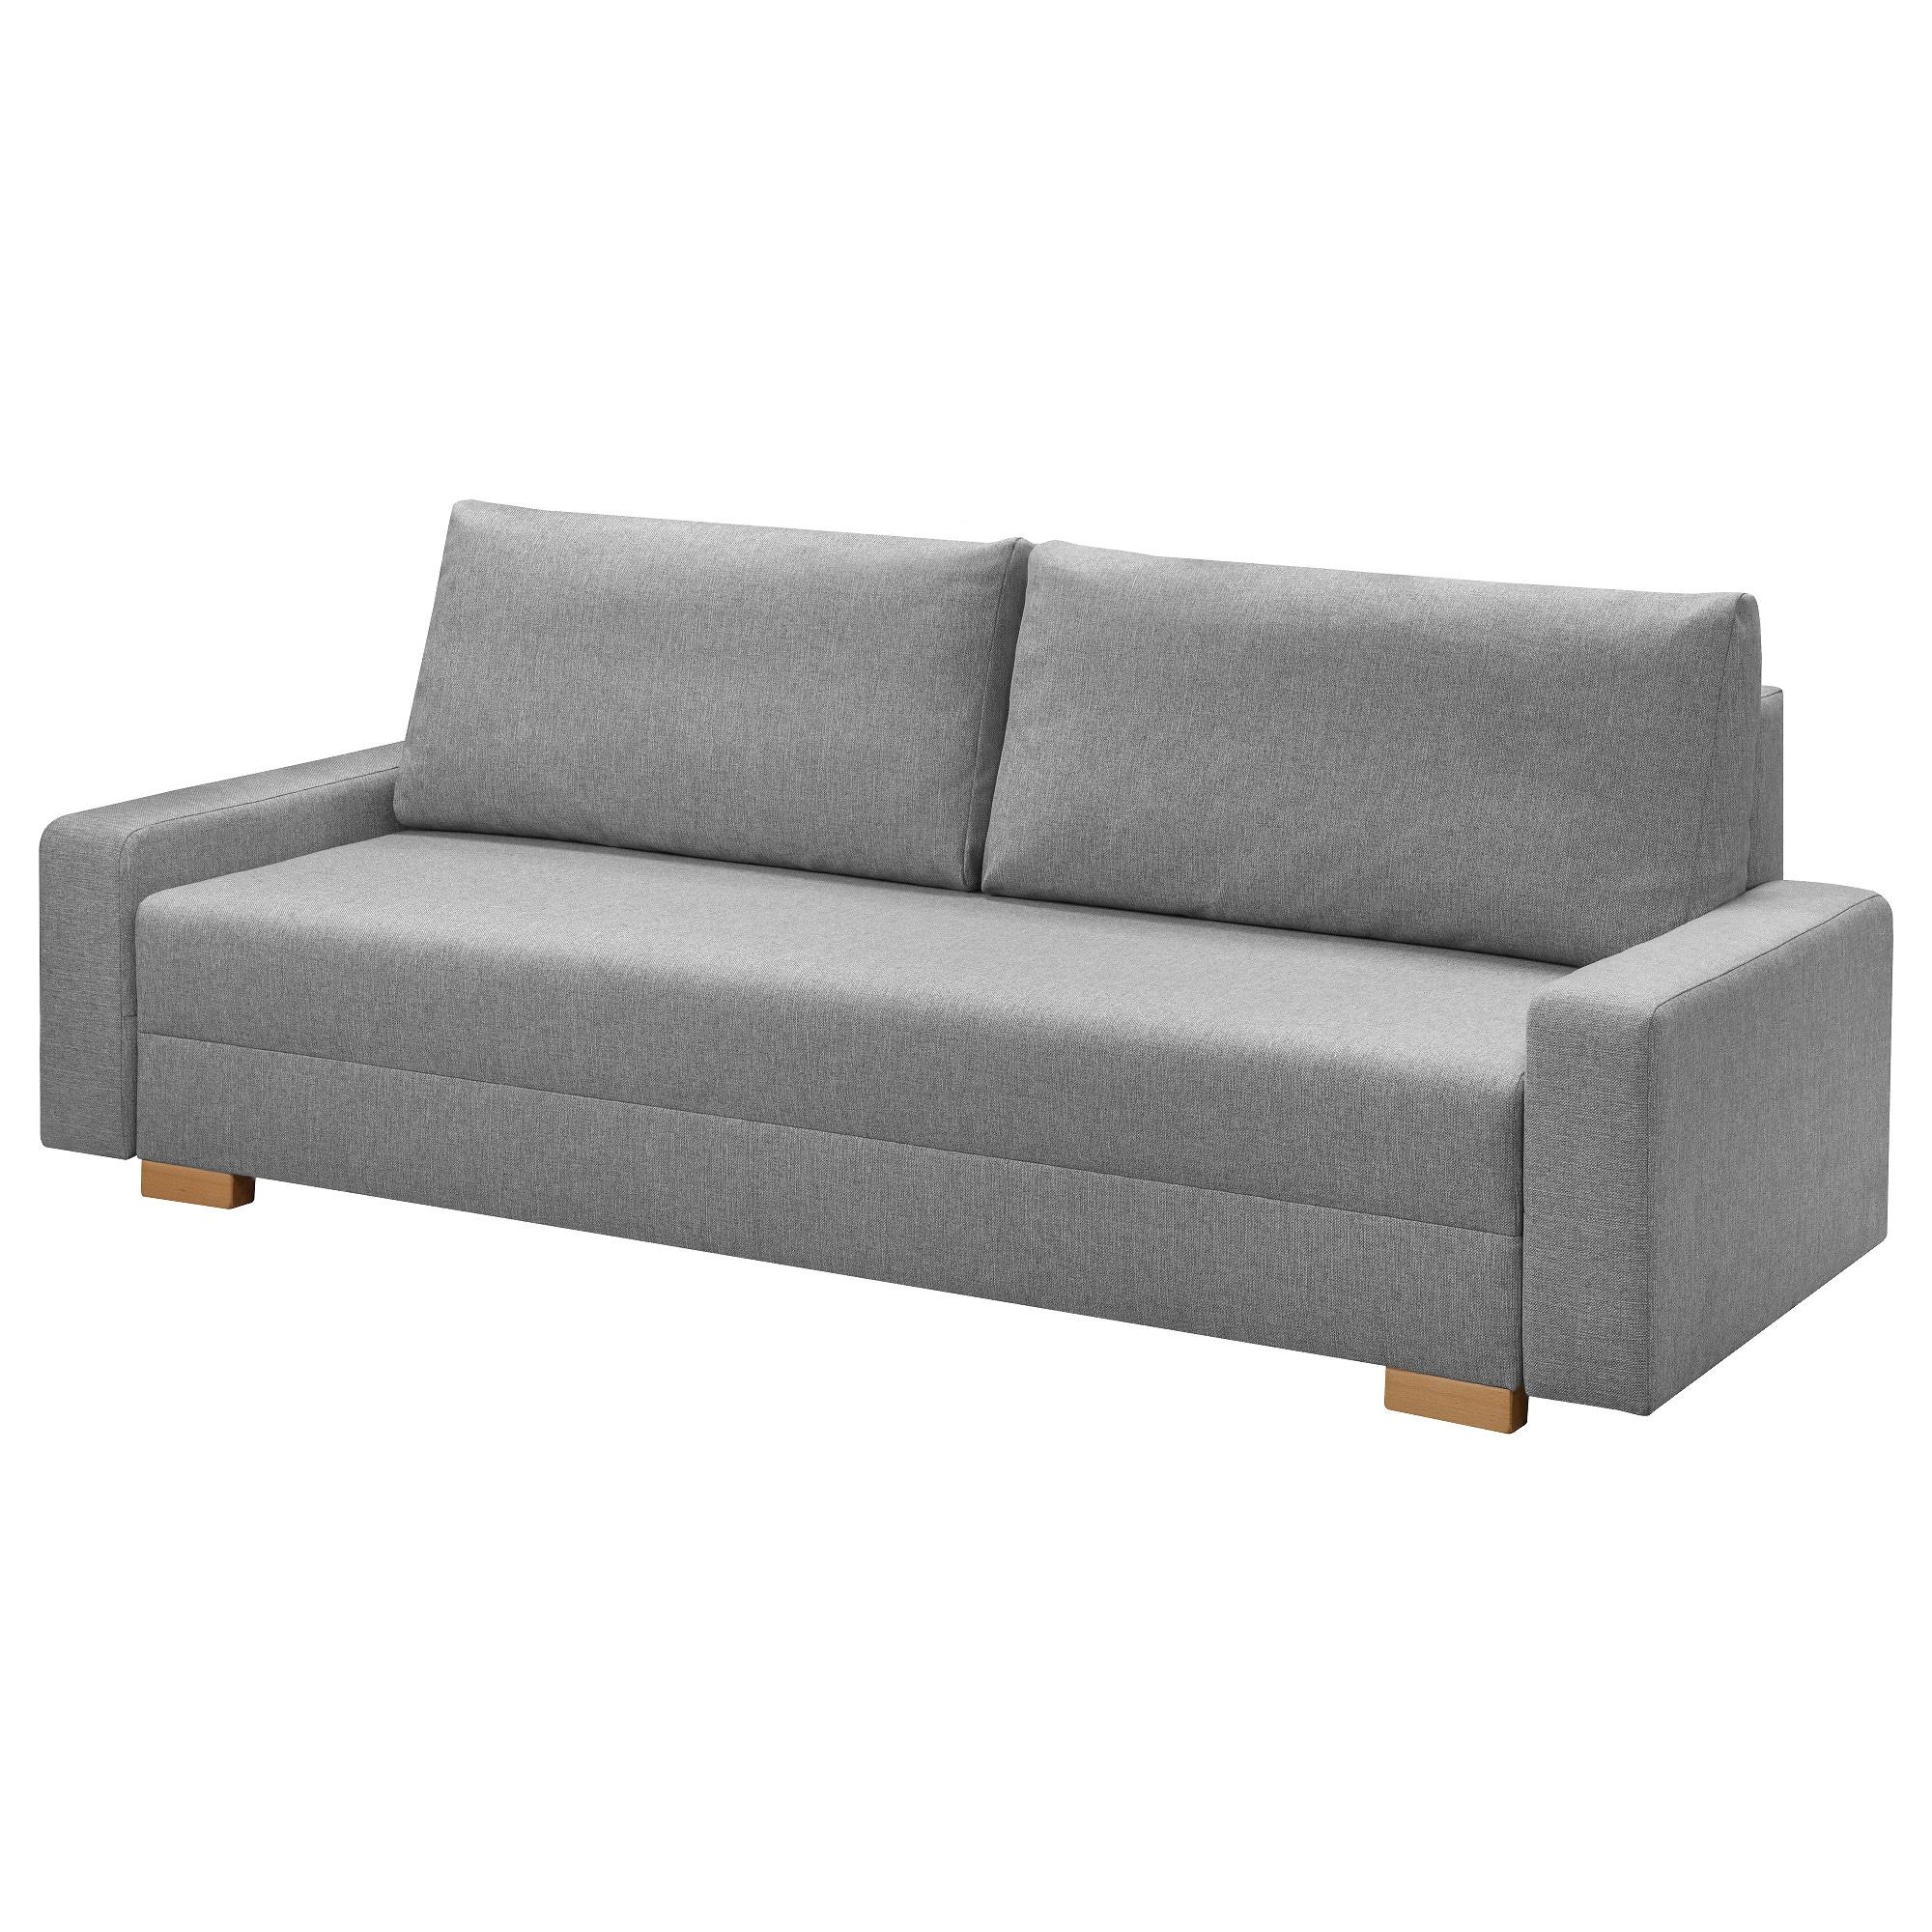 Gralviken Rozkladana Sofa 3 Osobowa Szary Kupuj Dzisiaj Ikea Bettsofa Sofa Bett Sofa